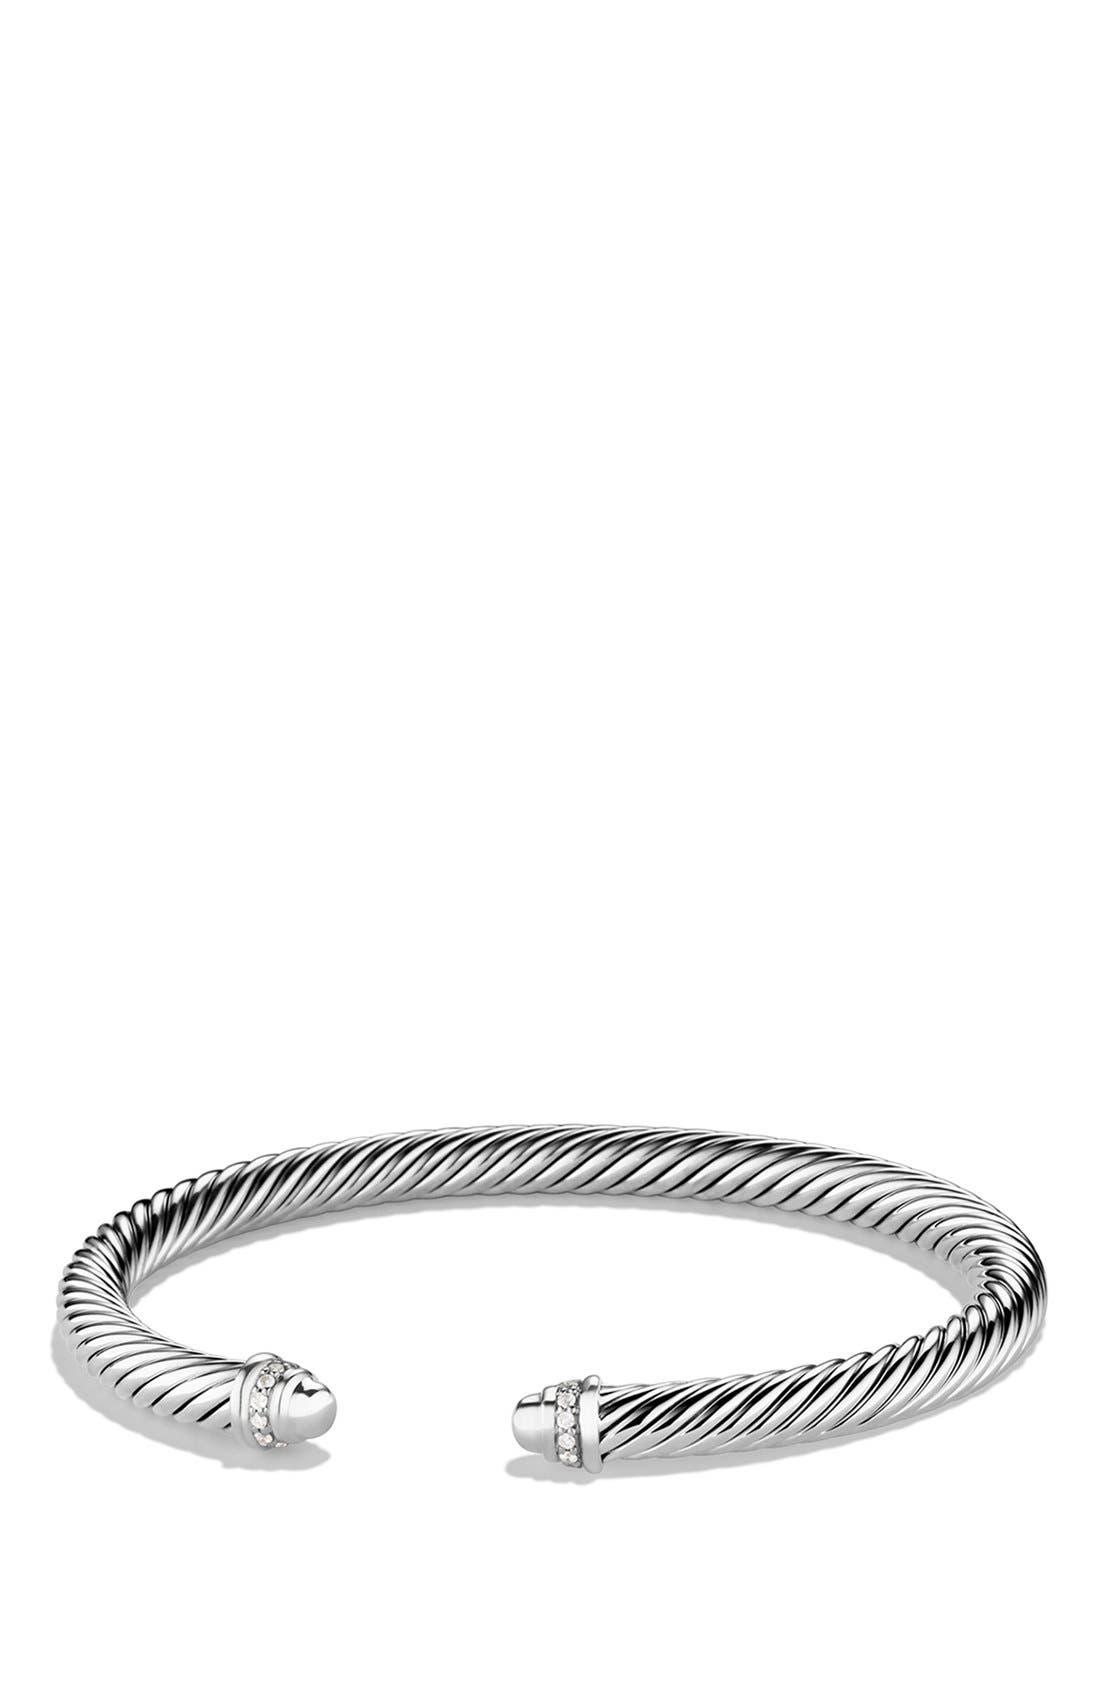 David Yurman 'Cable Classics' Bracelet with Diamonds